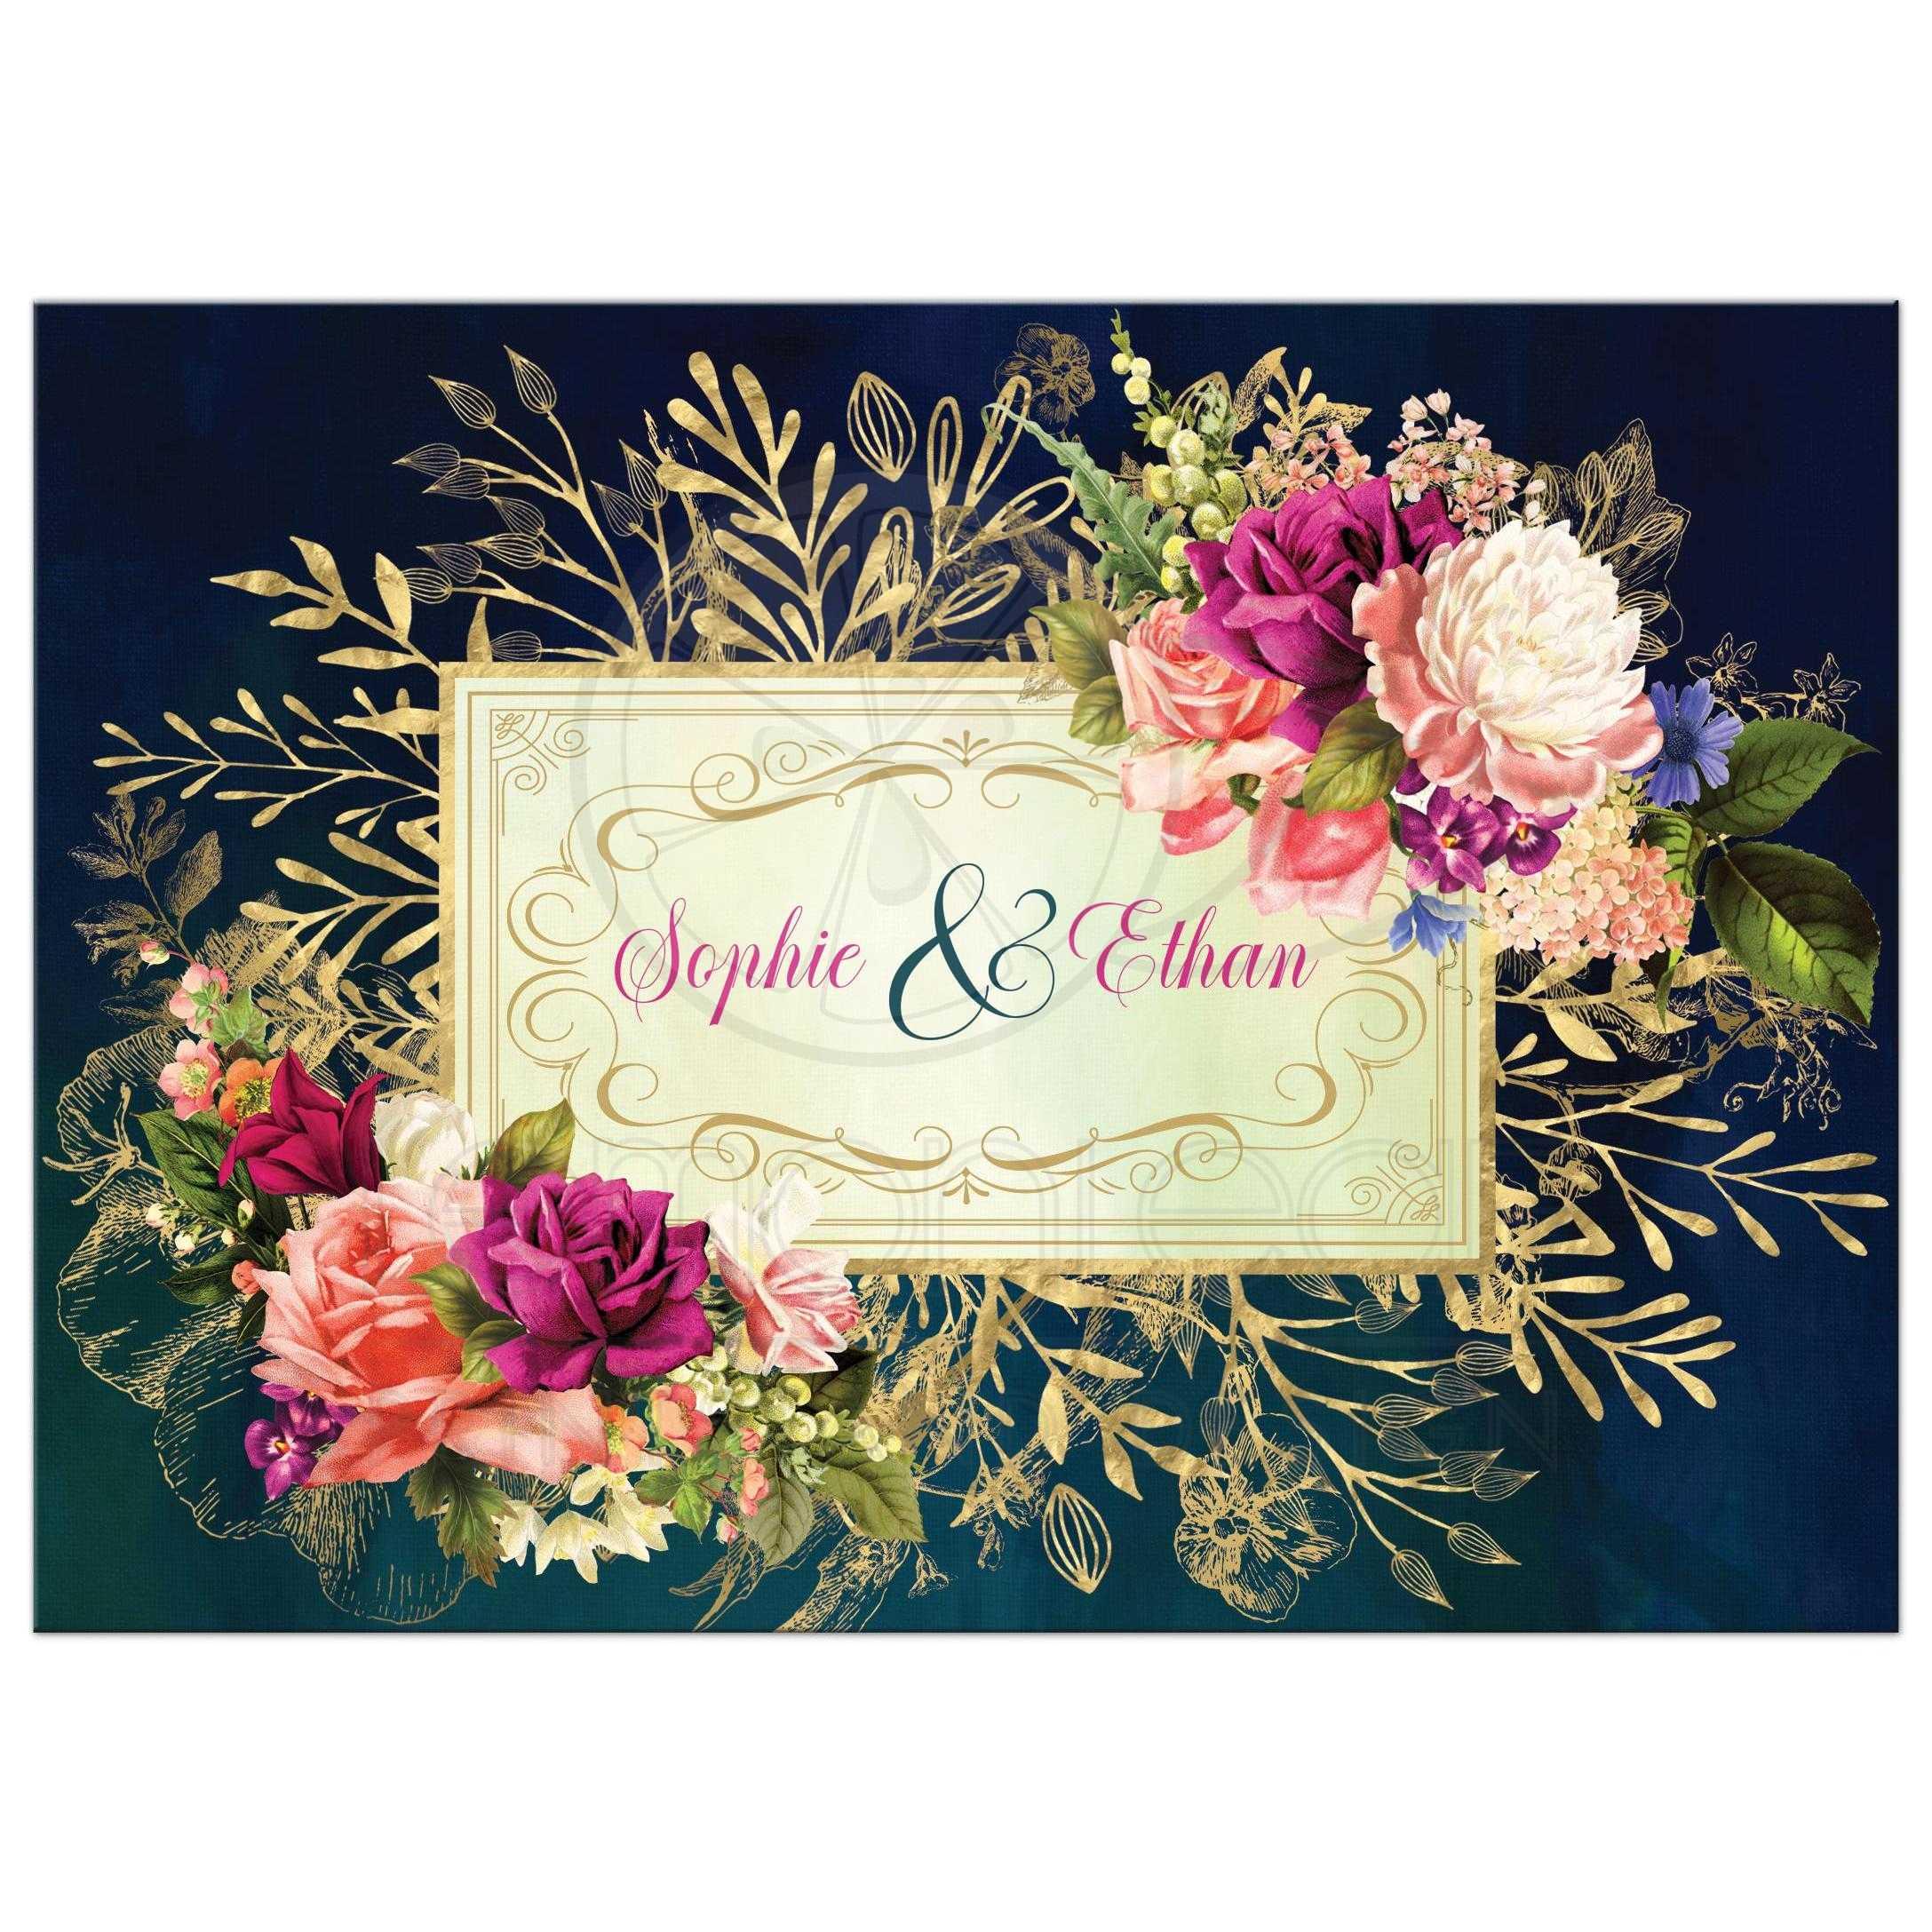 Floral Wedding Invitations.Teal Navy Green Gold Bold Florals Foliage Wedding Invitation